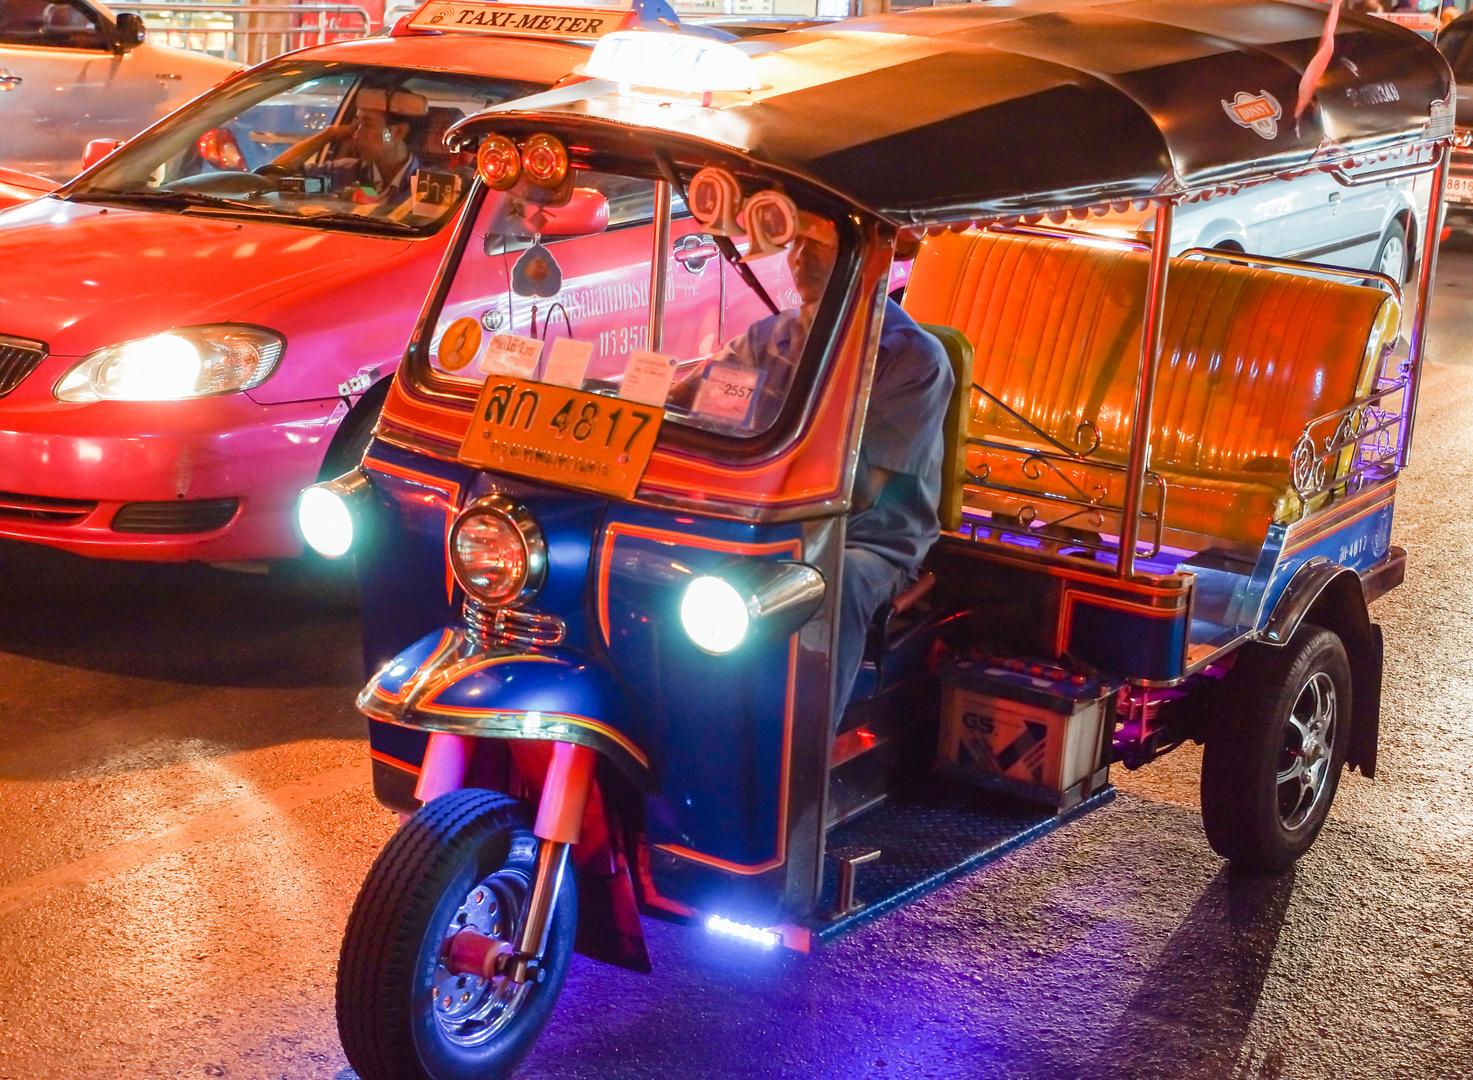 Tuk Tuk I - Bangkok/Thailand